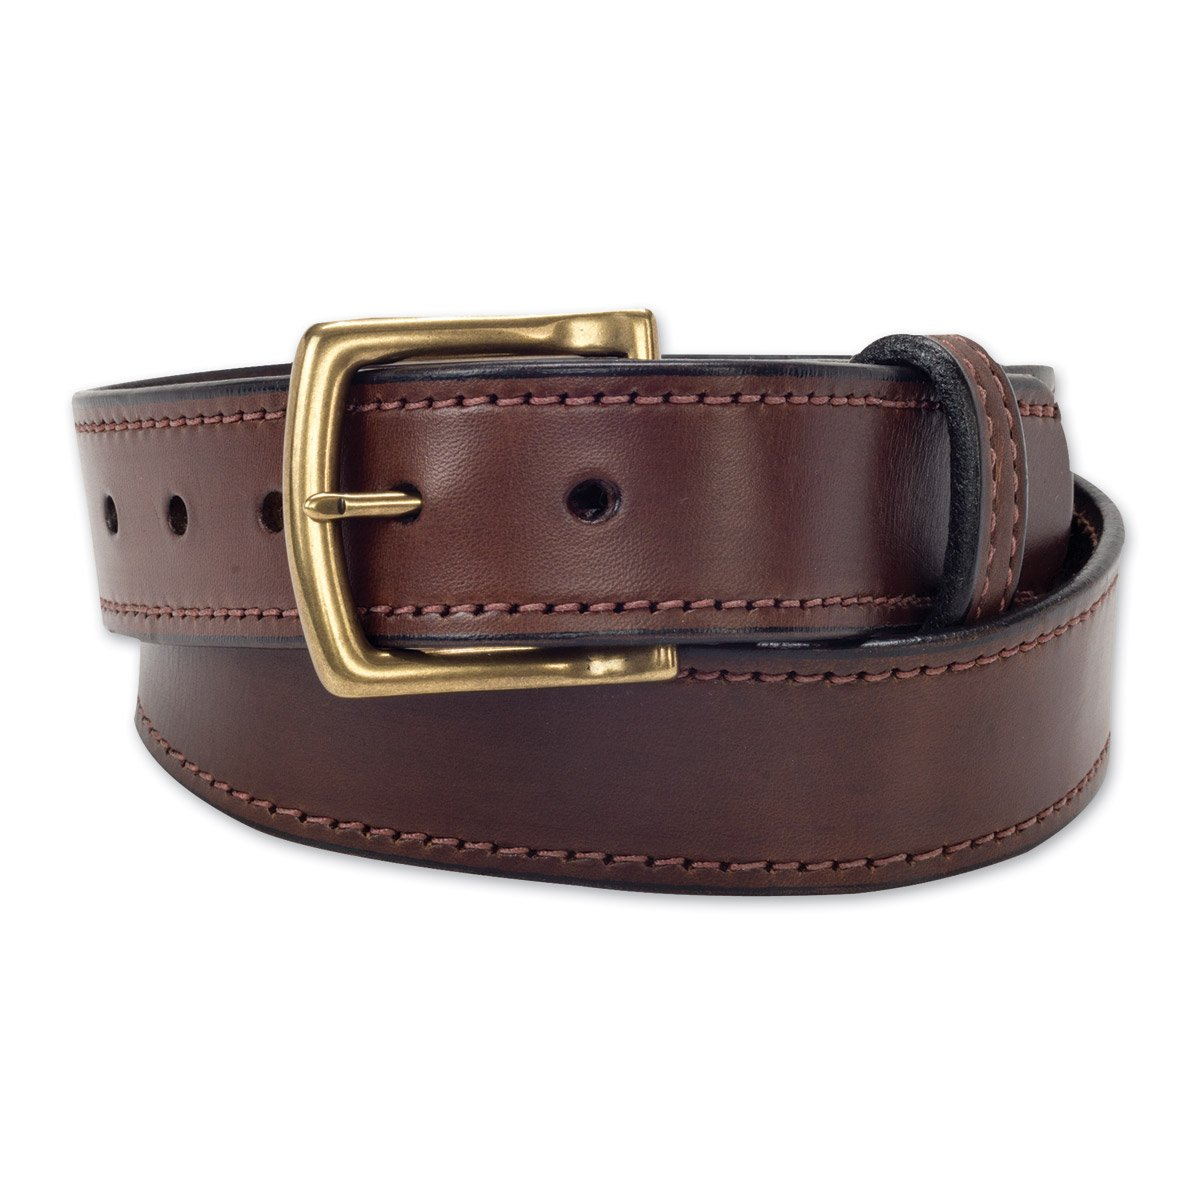 Roland Sands Design Debo Tobacco Belt, XL